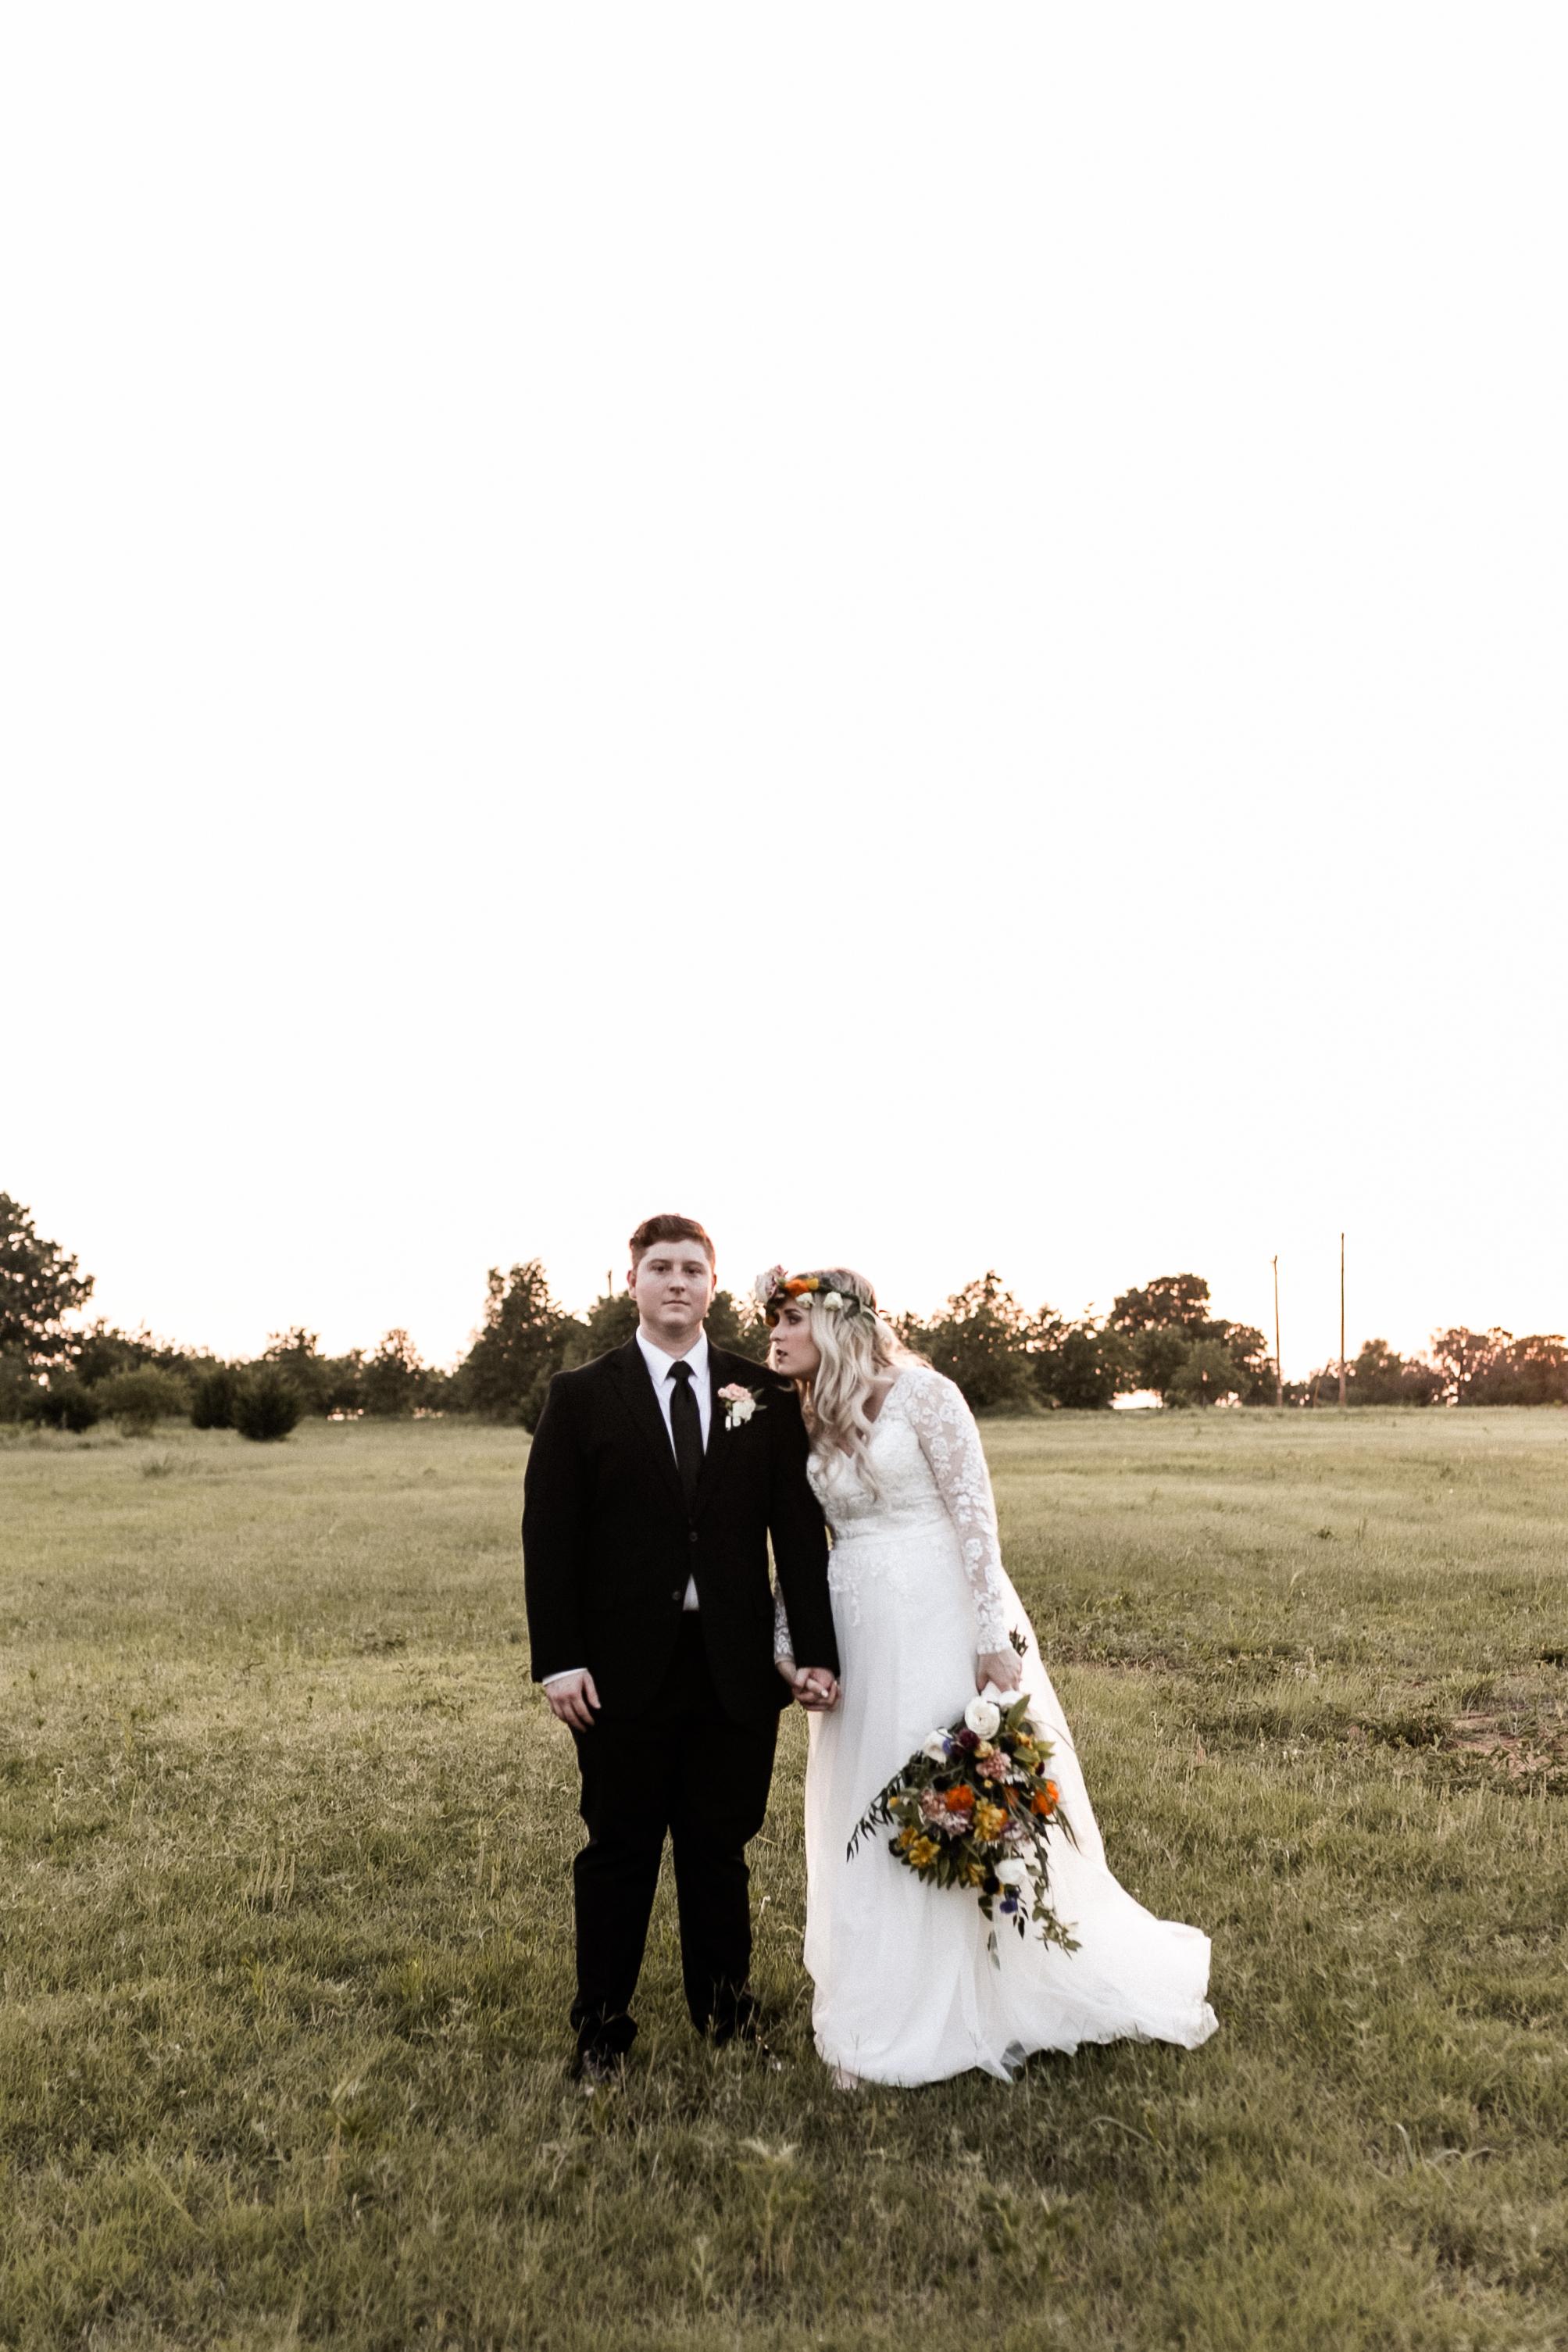 Crumly Wedding 2 KHP70009.JPG